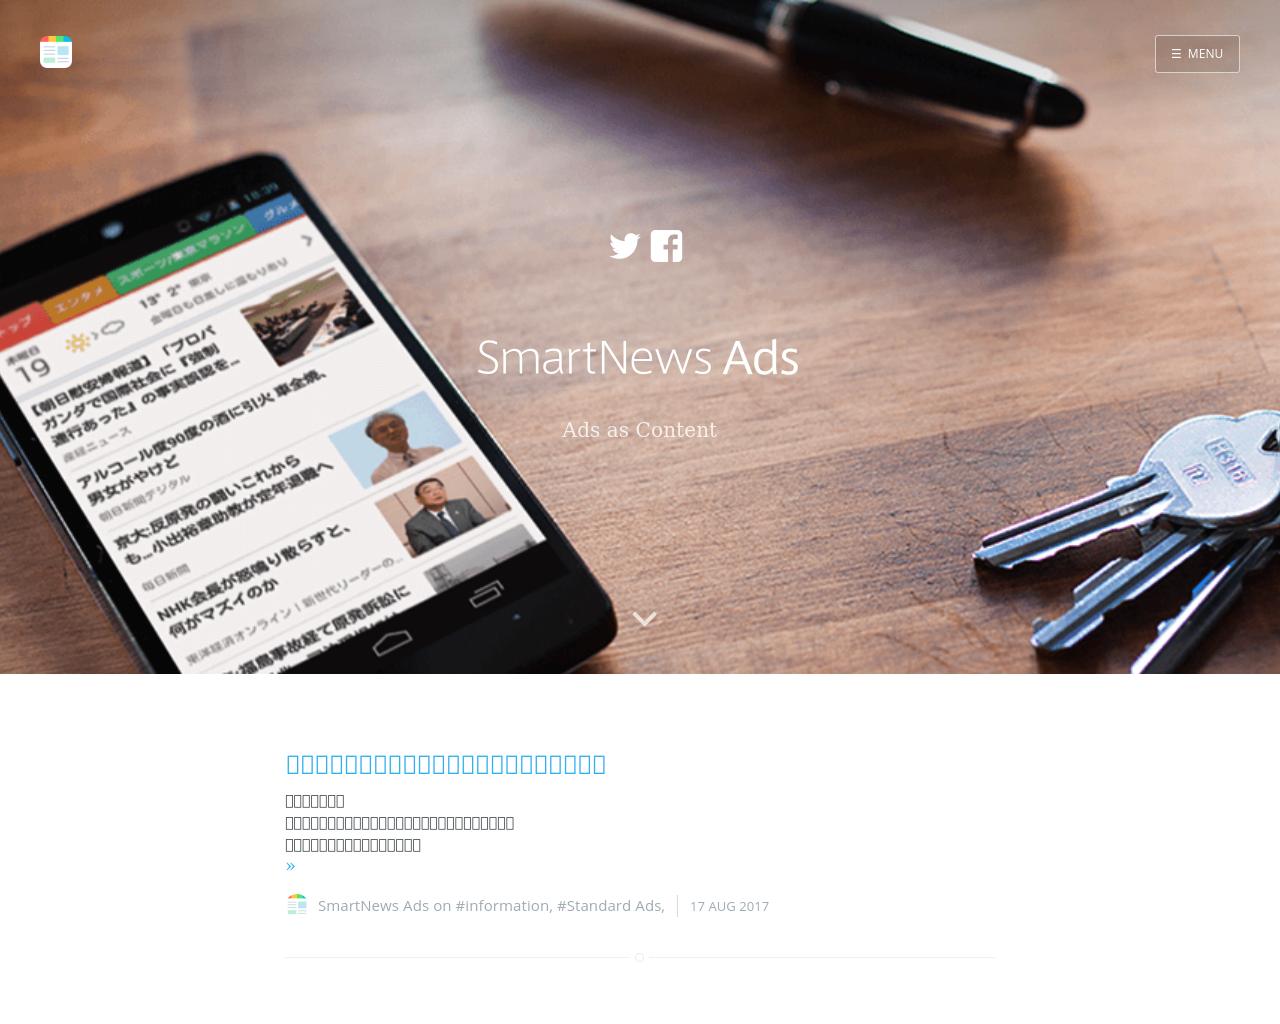 SmartNews-Ads-Advertising-Reviews-Pricing